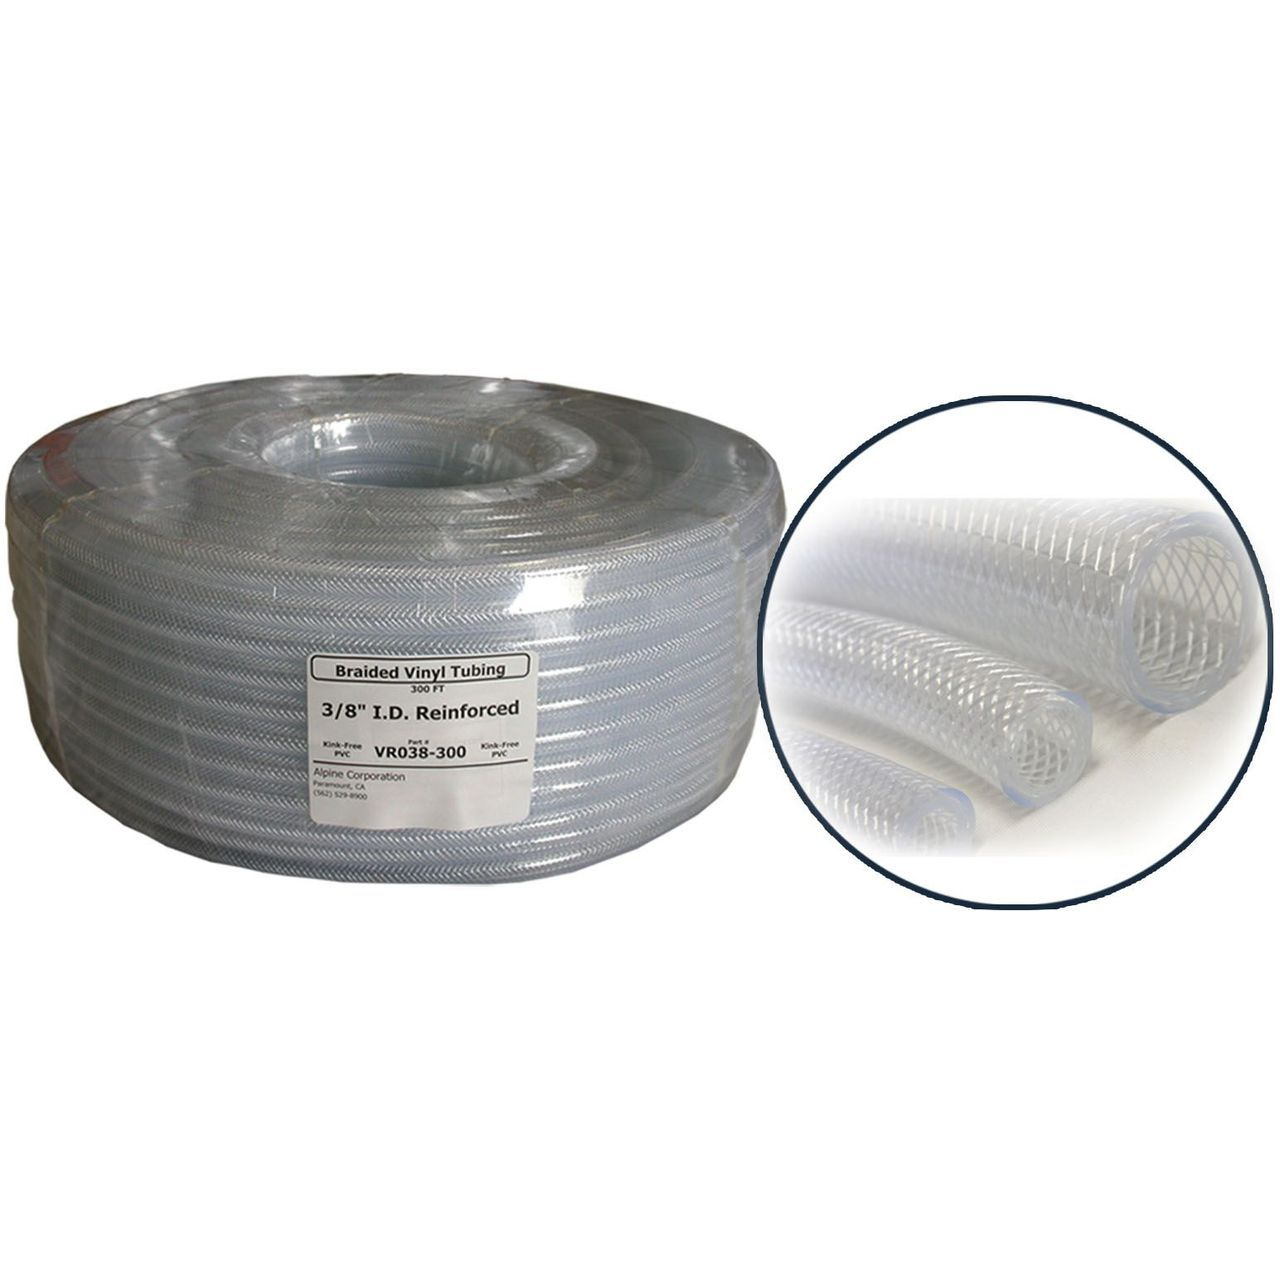 Alpine VR012 PVC Clear Braided Tubing - 1/2'' ID x 3/4'' OD x 100' Coil